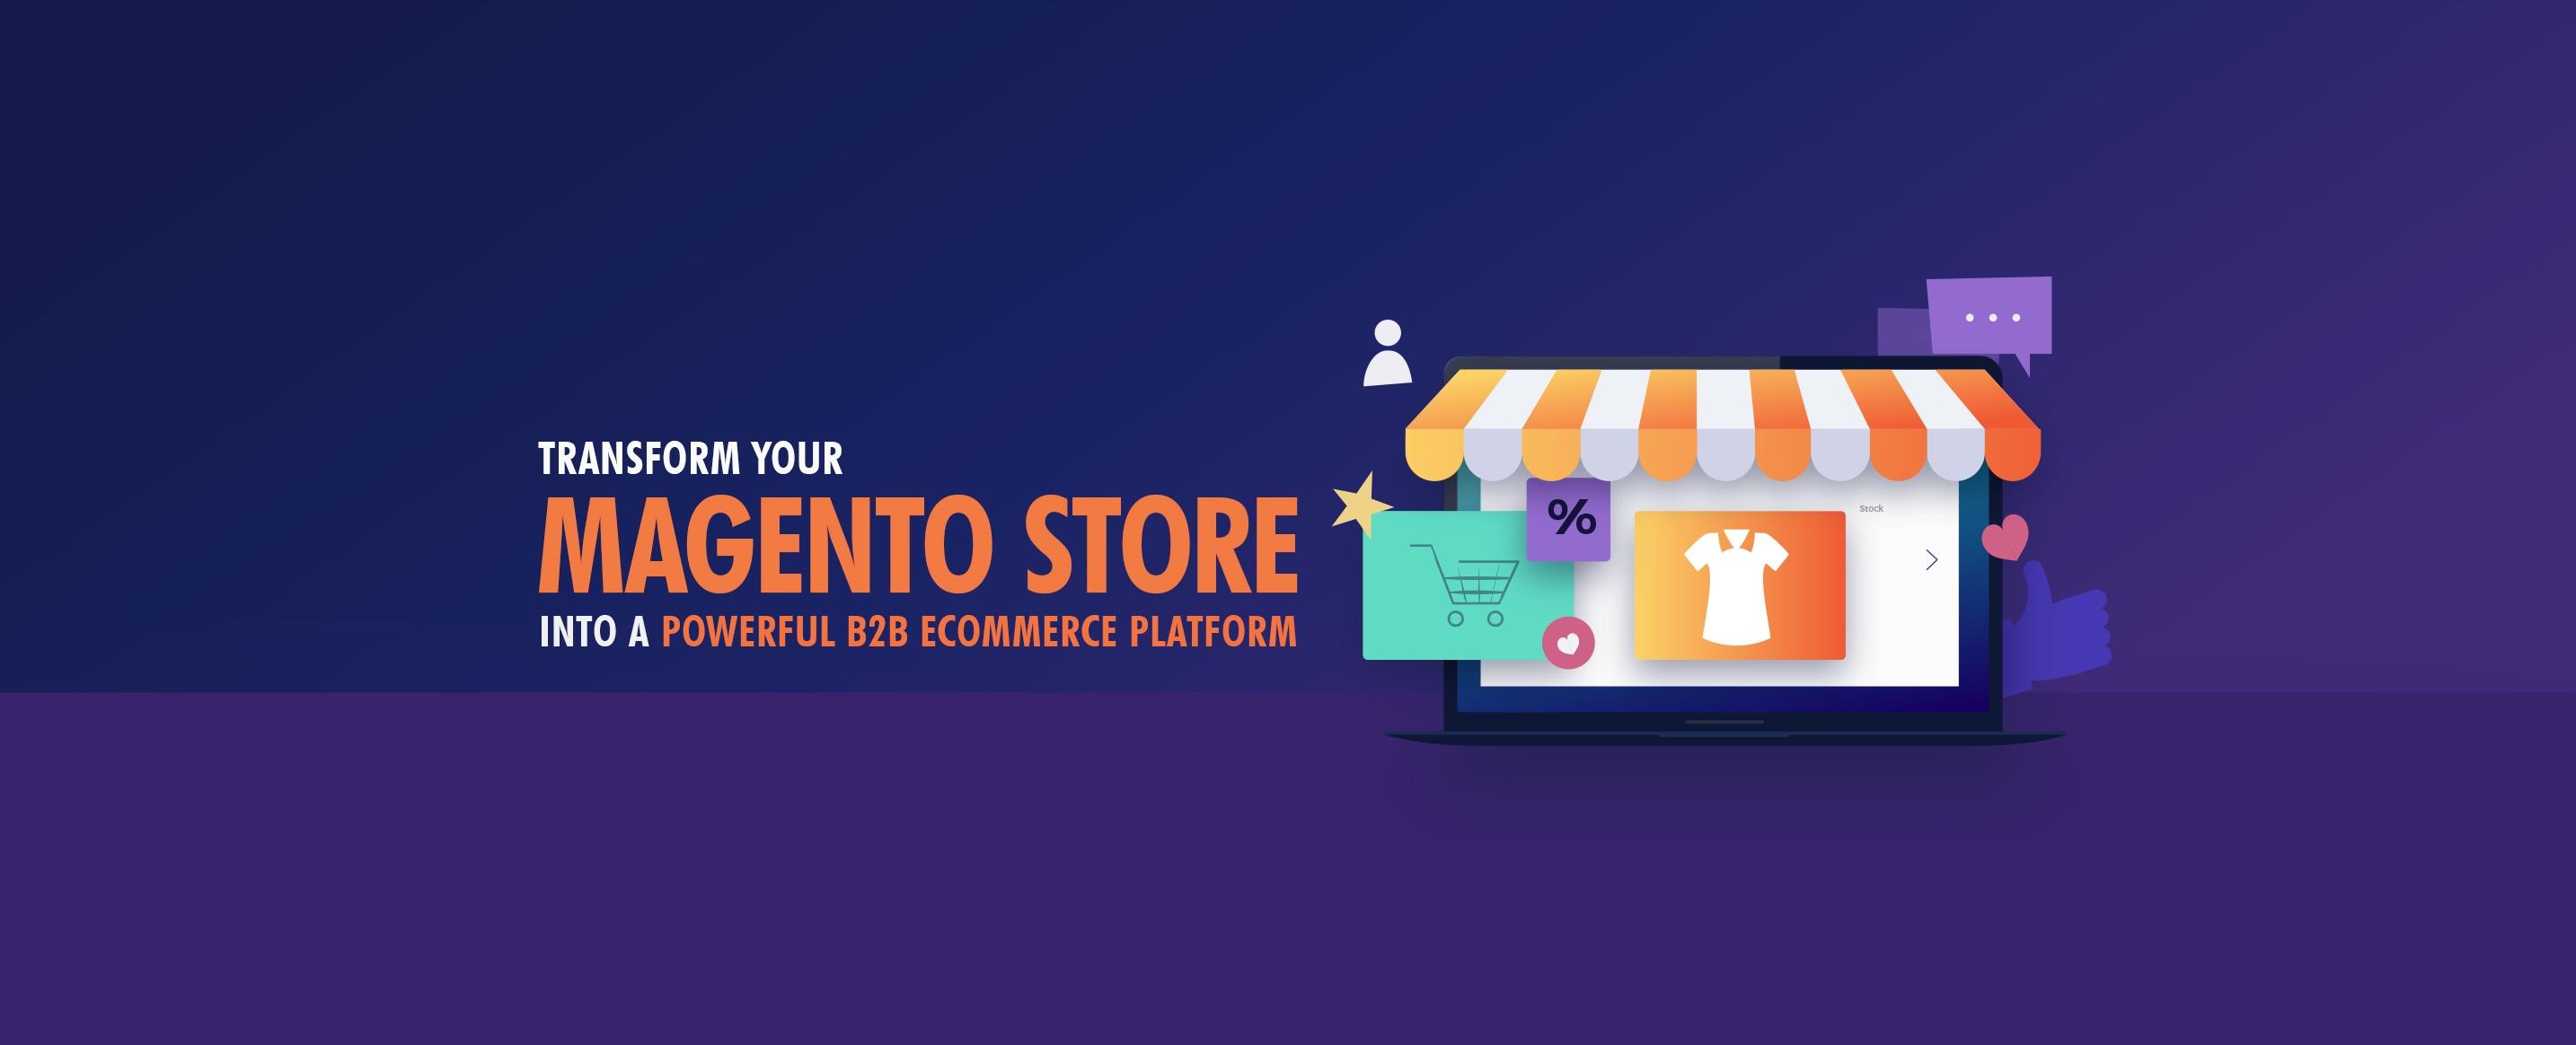 Transform-your-Magento-Store-into-a-Powerful-B2B-Ecommerce-Platform